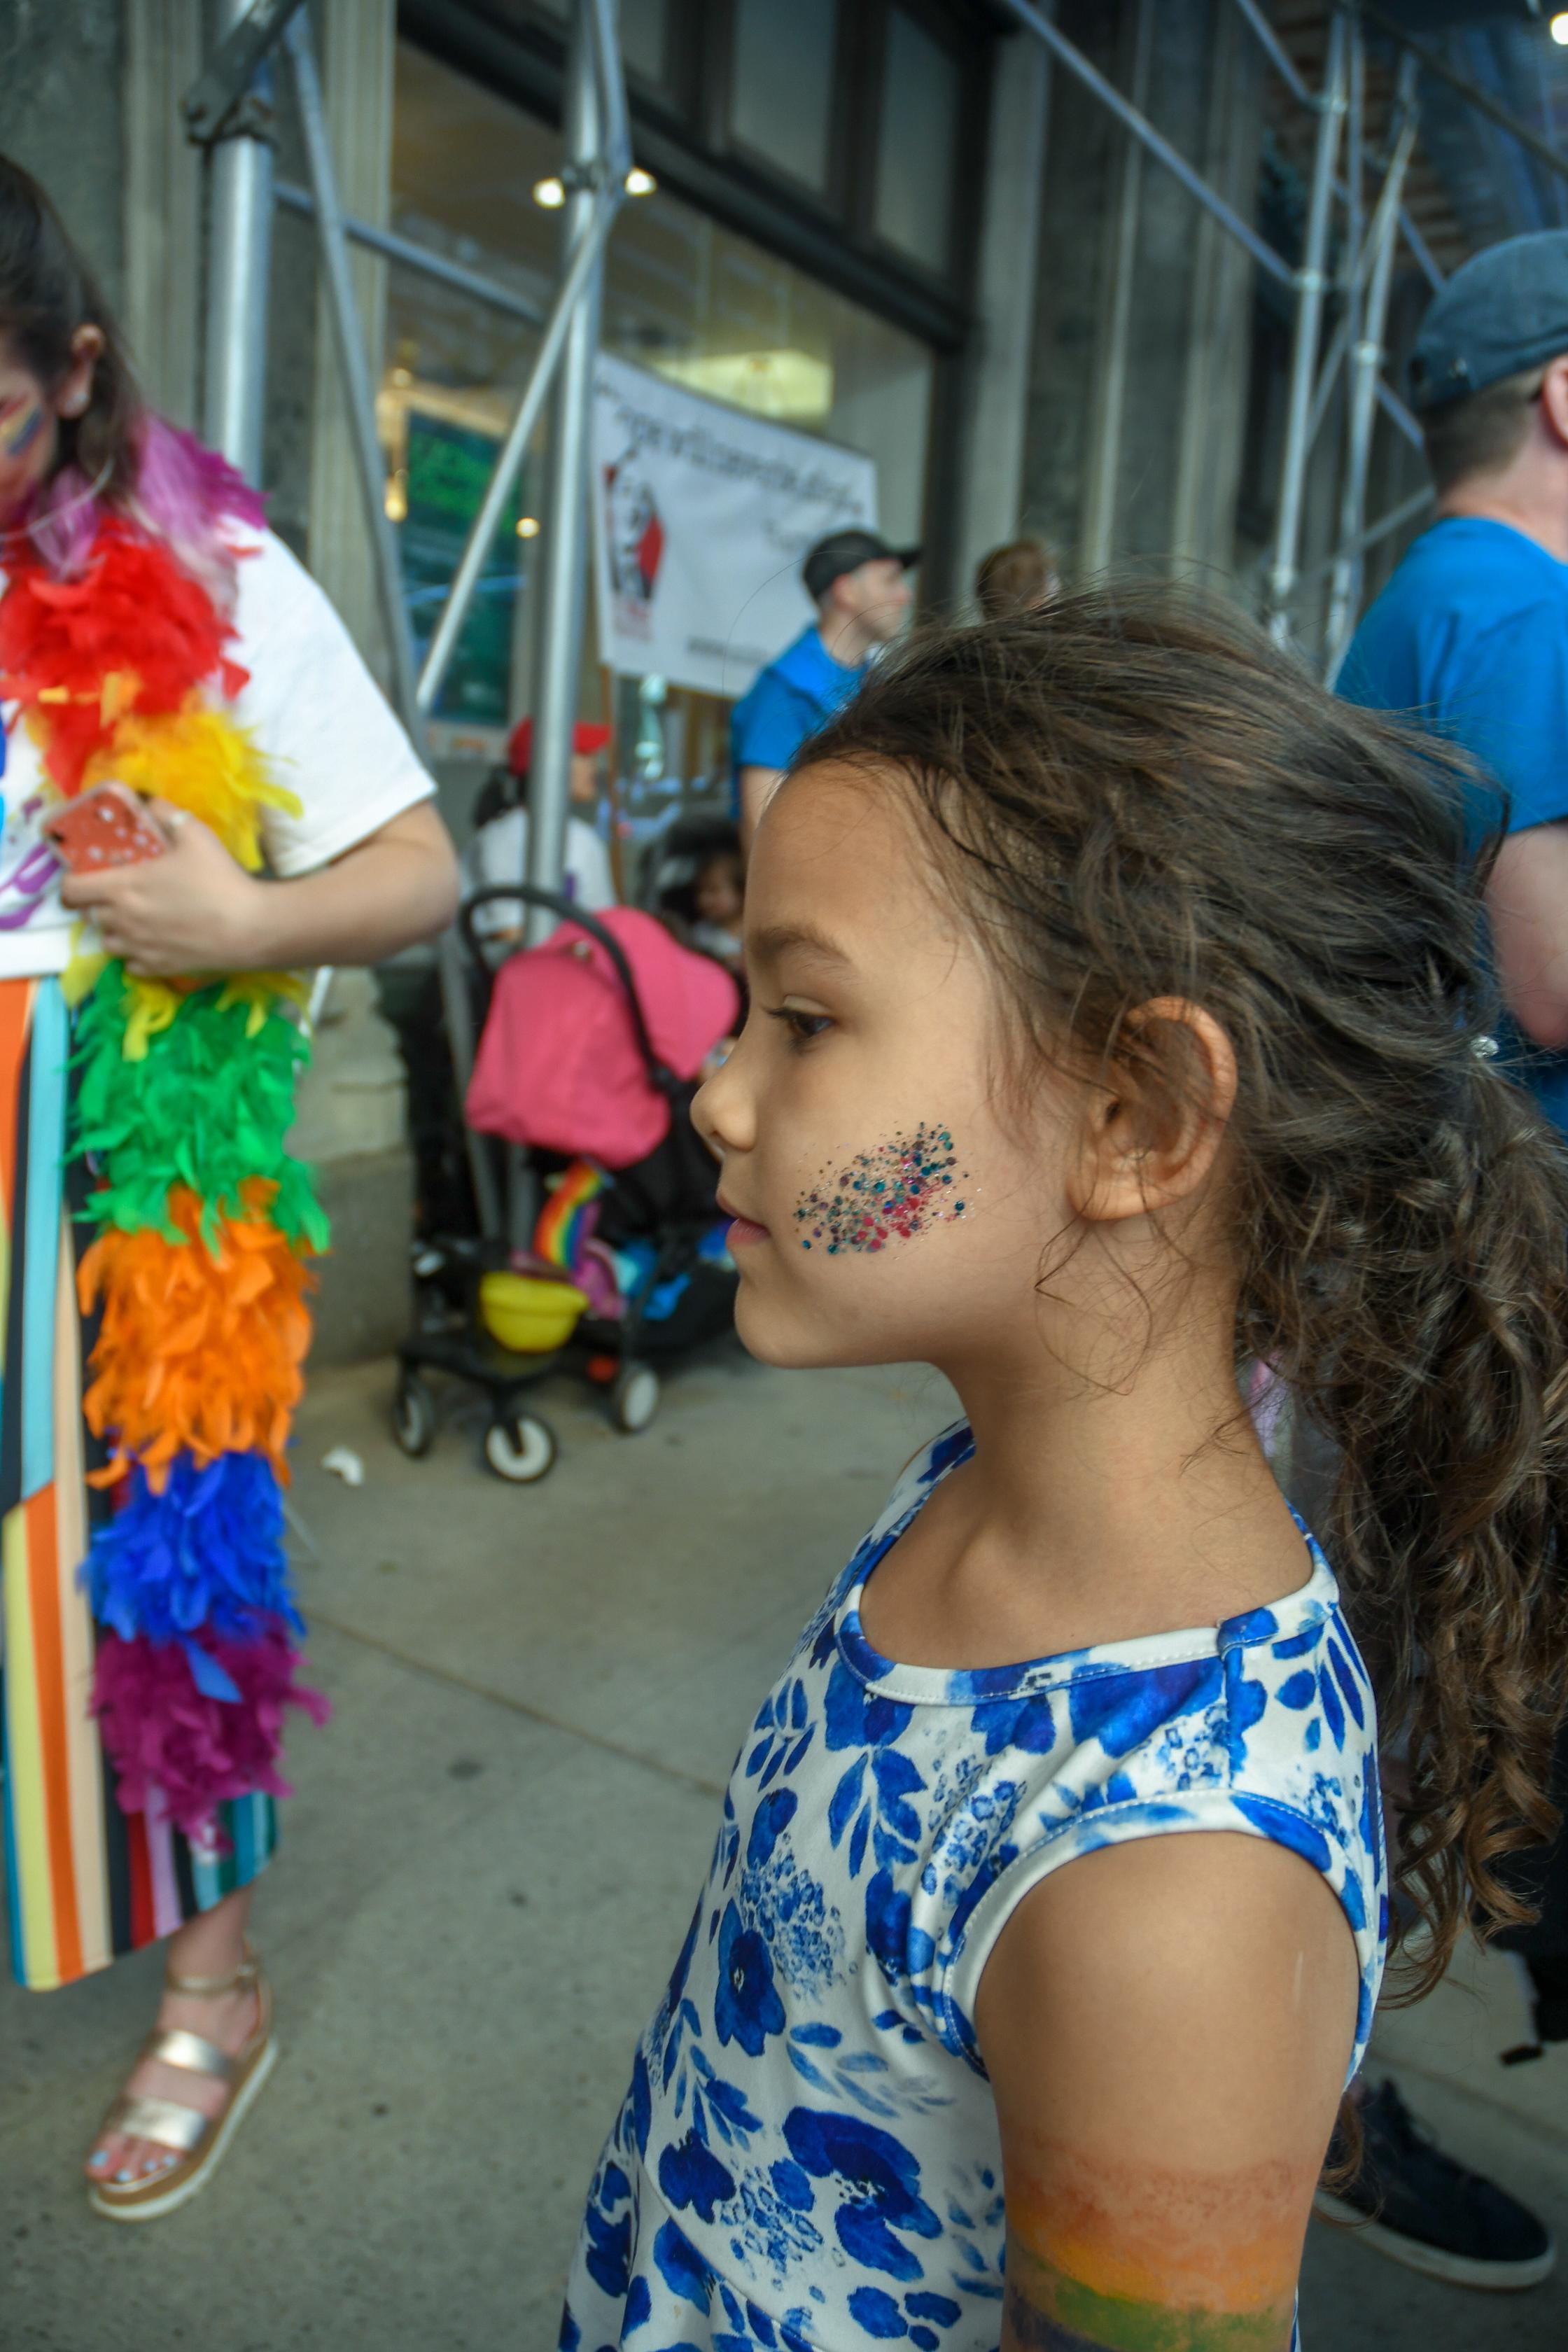 SC-PrideParade-2019_FE-99.jpg